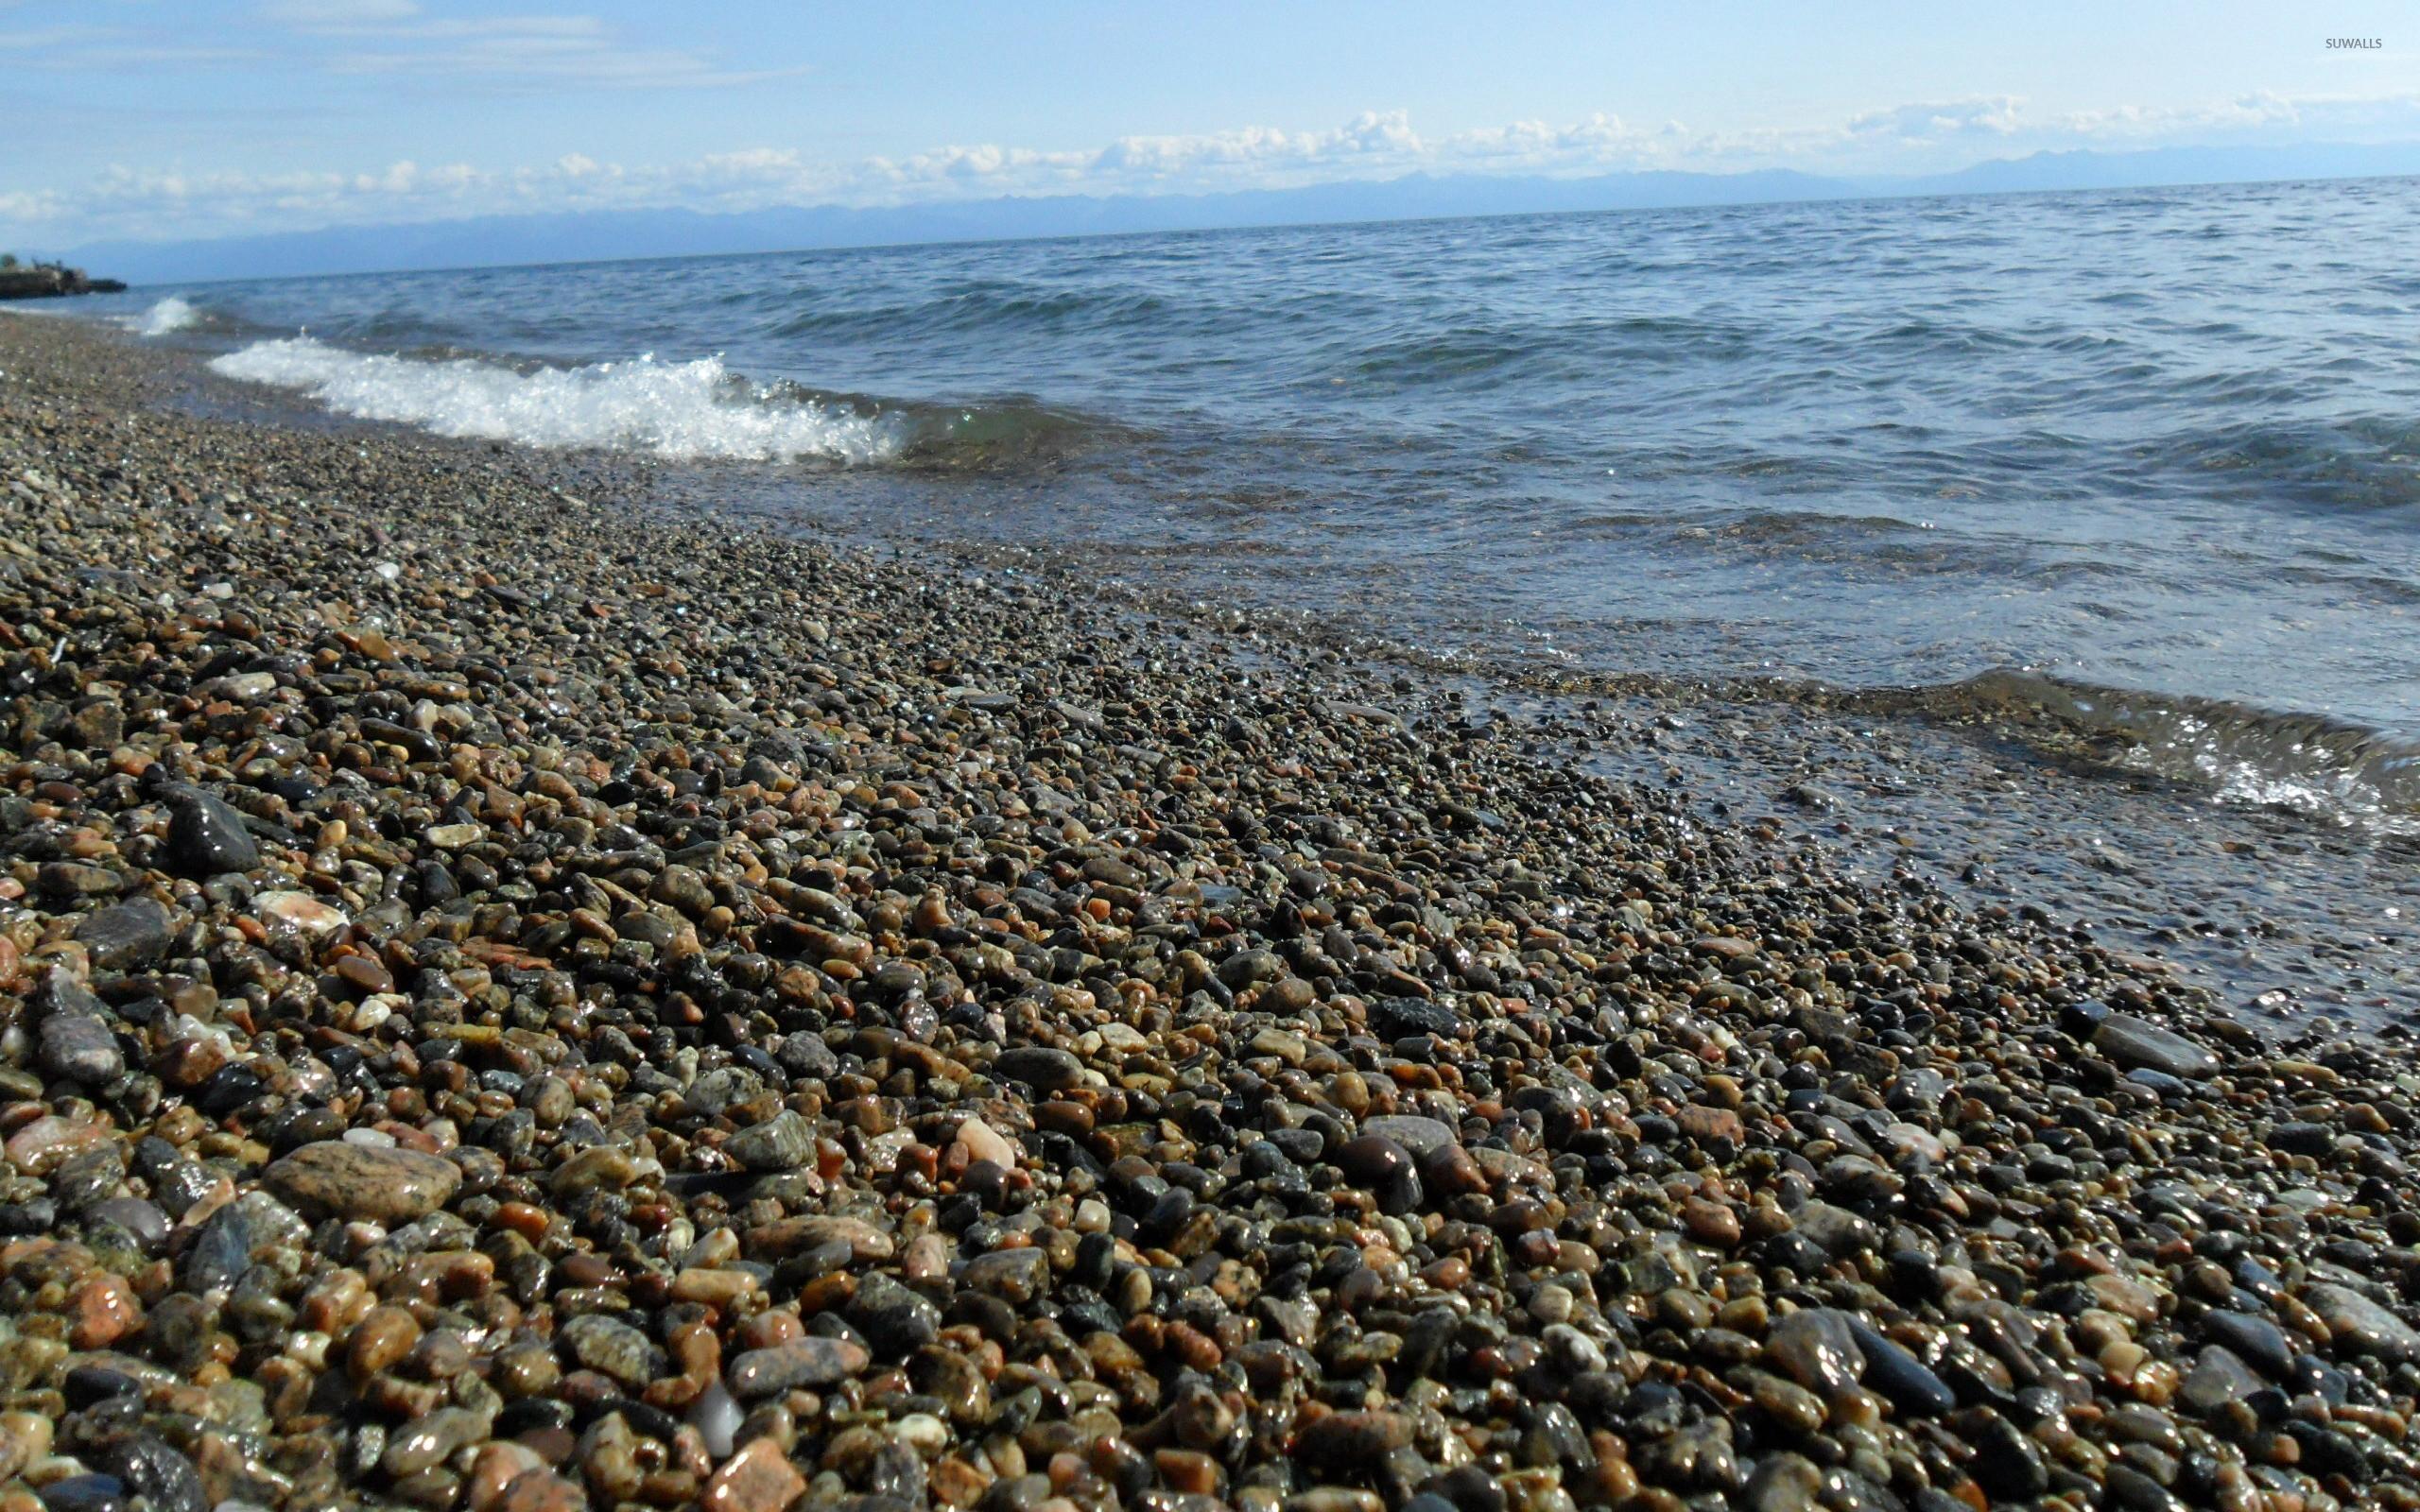 Res: 2560x1600, Pebble beach at the ocean [2] wallpaper